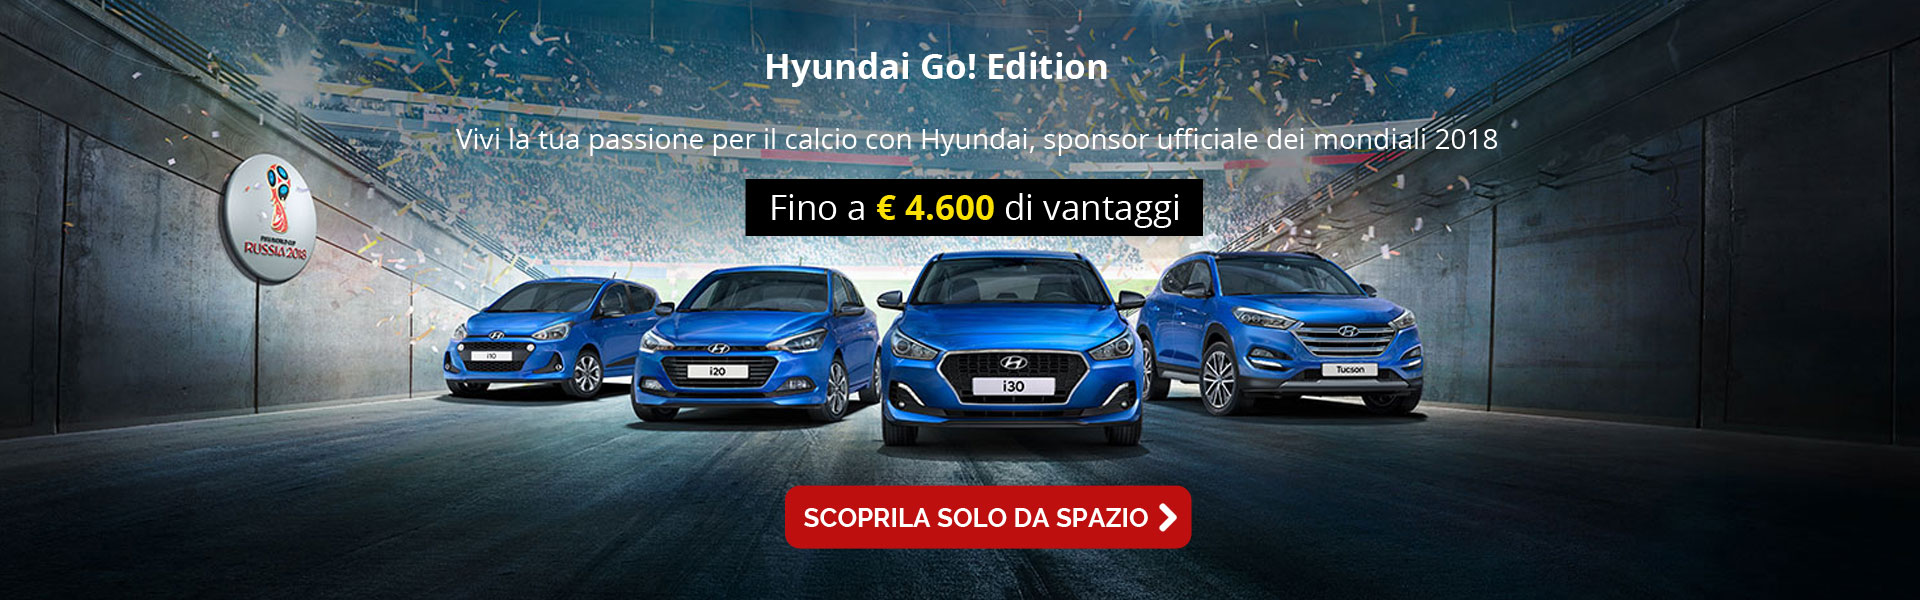 Hyundai Go Edition